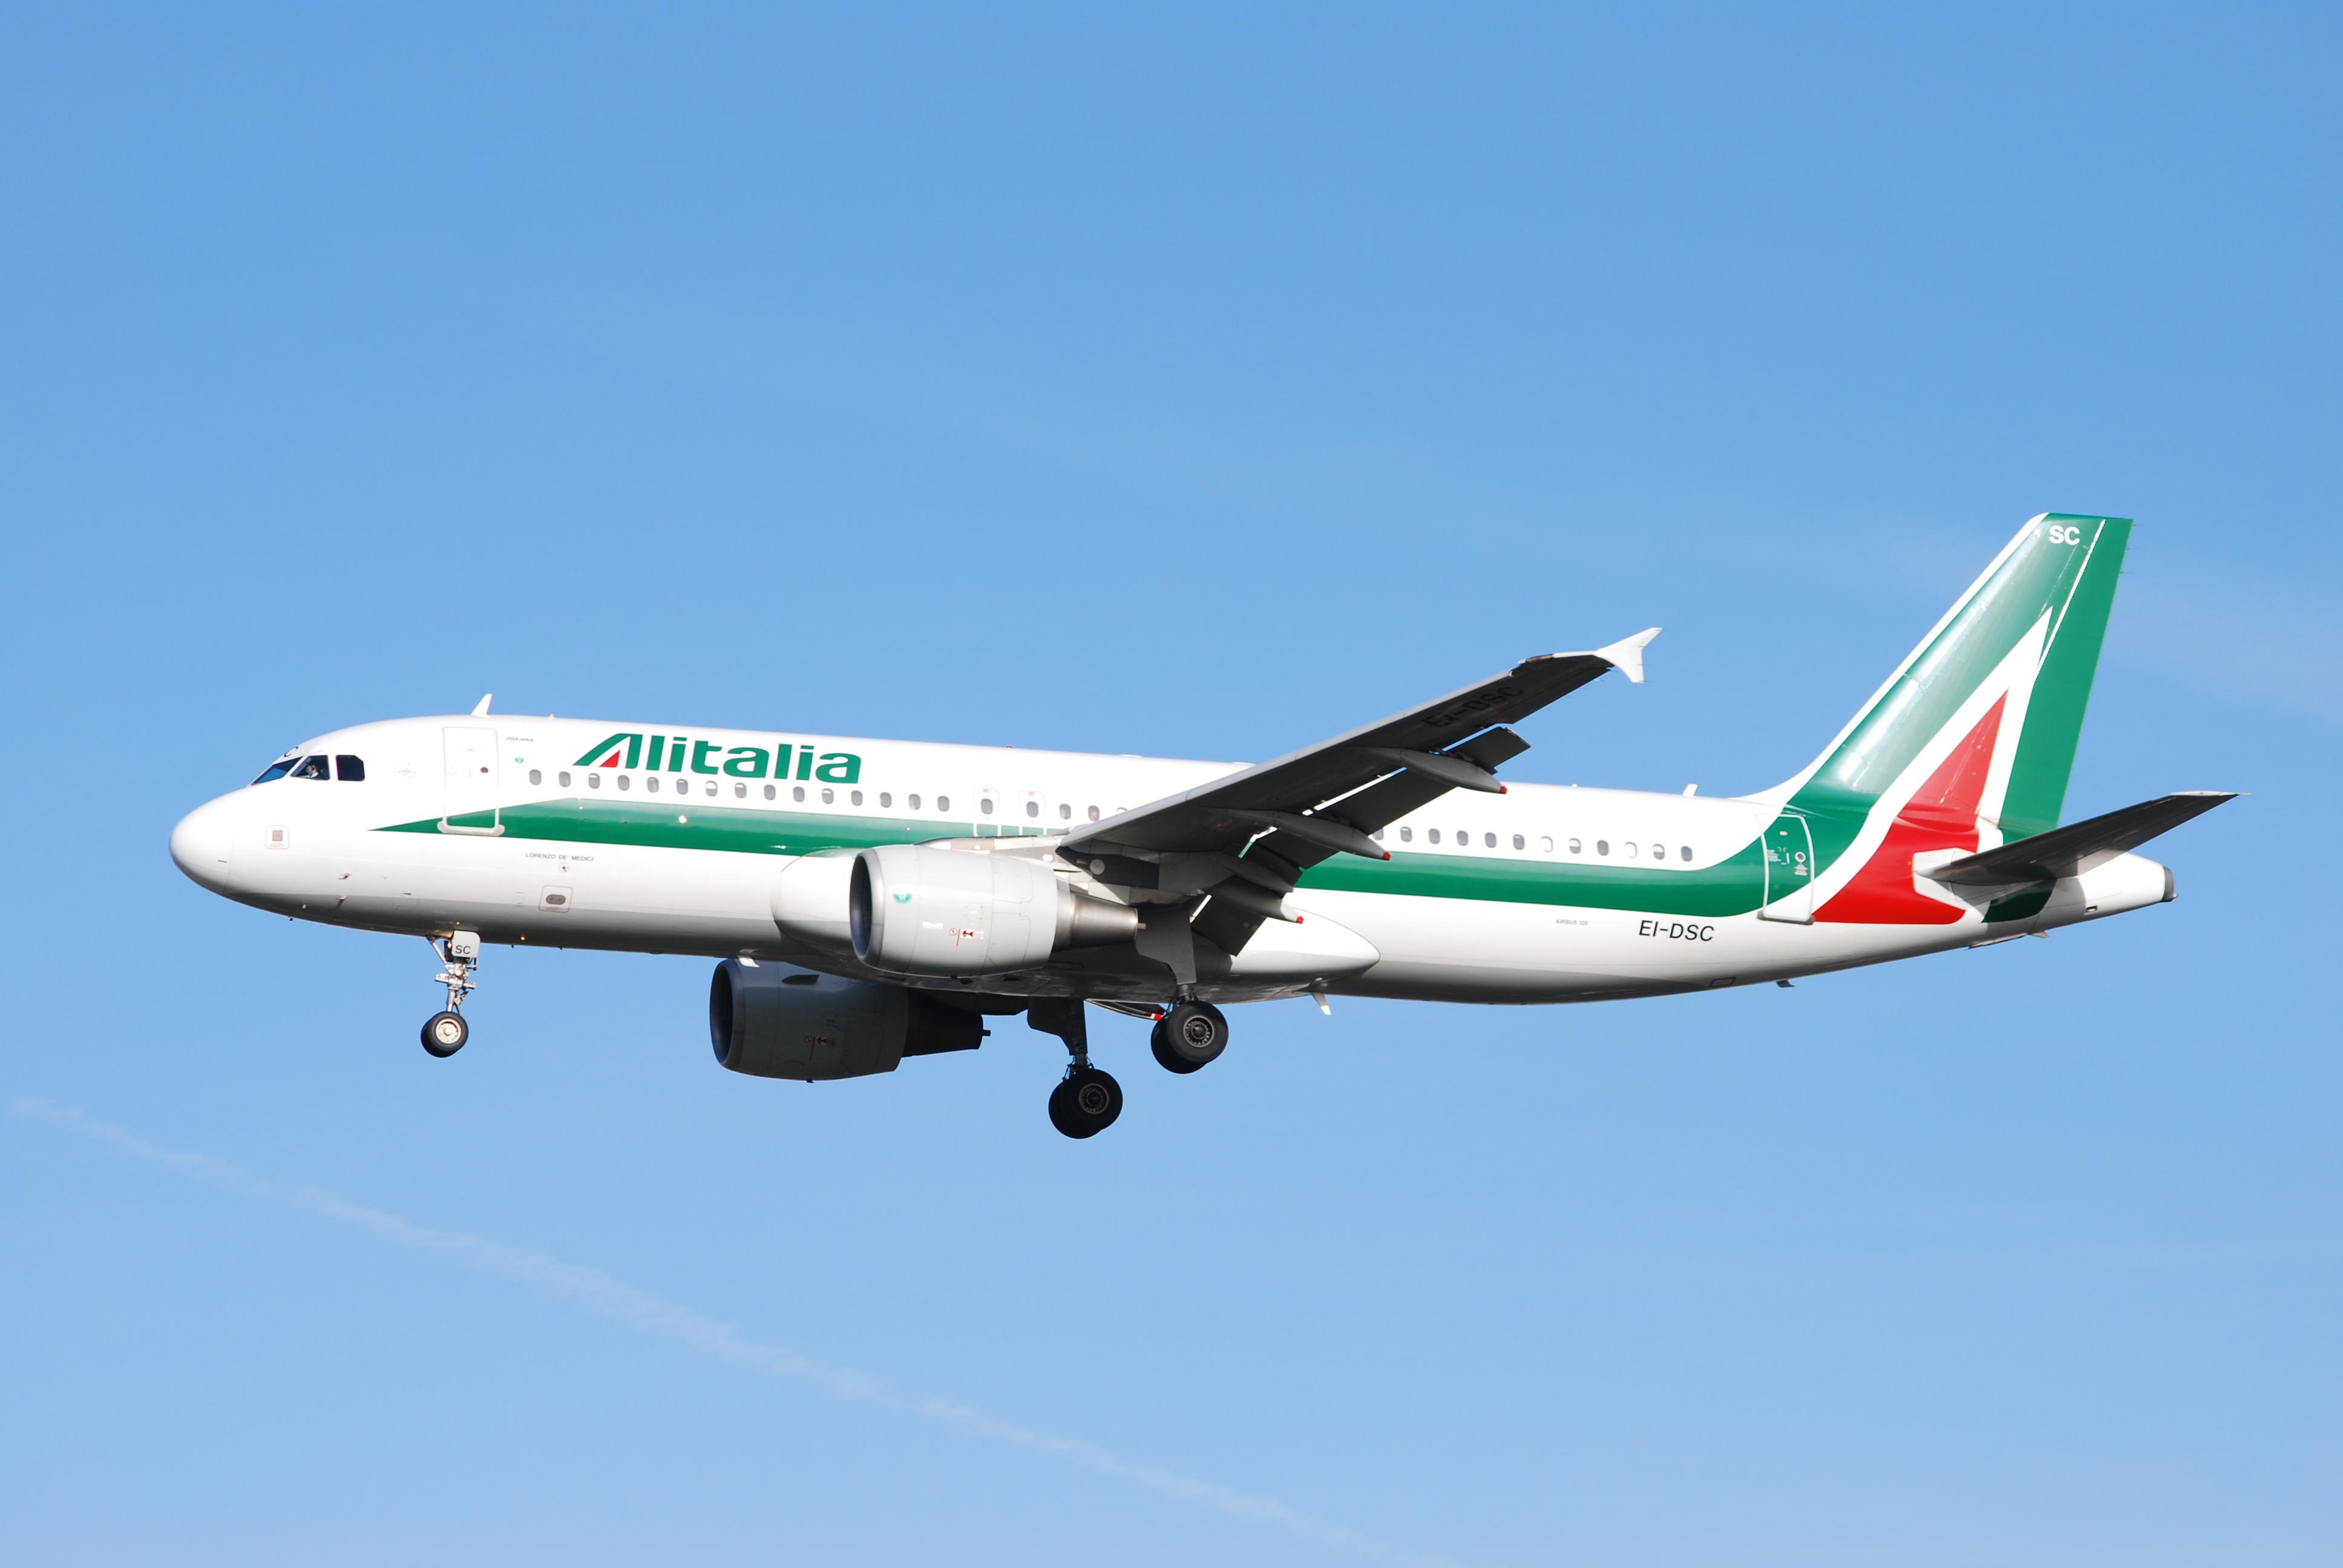 EI-DSC A320 Alitalia